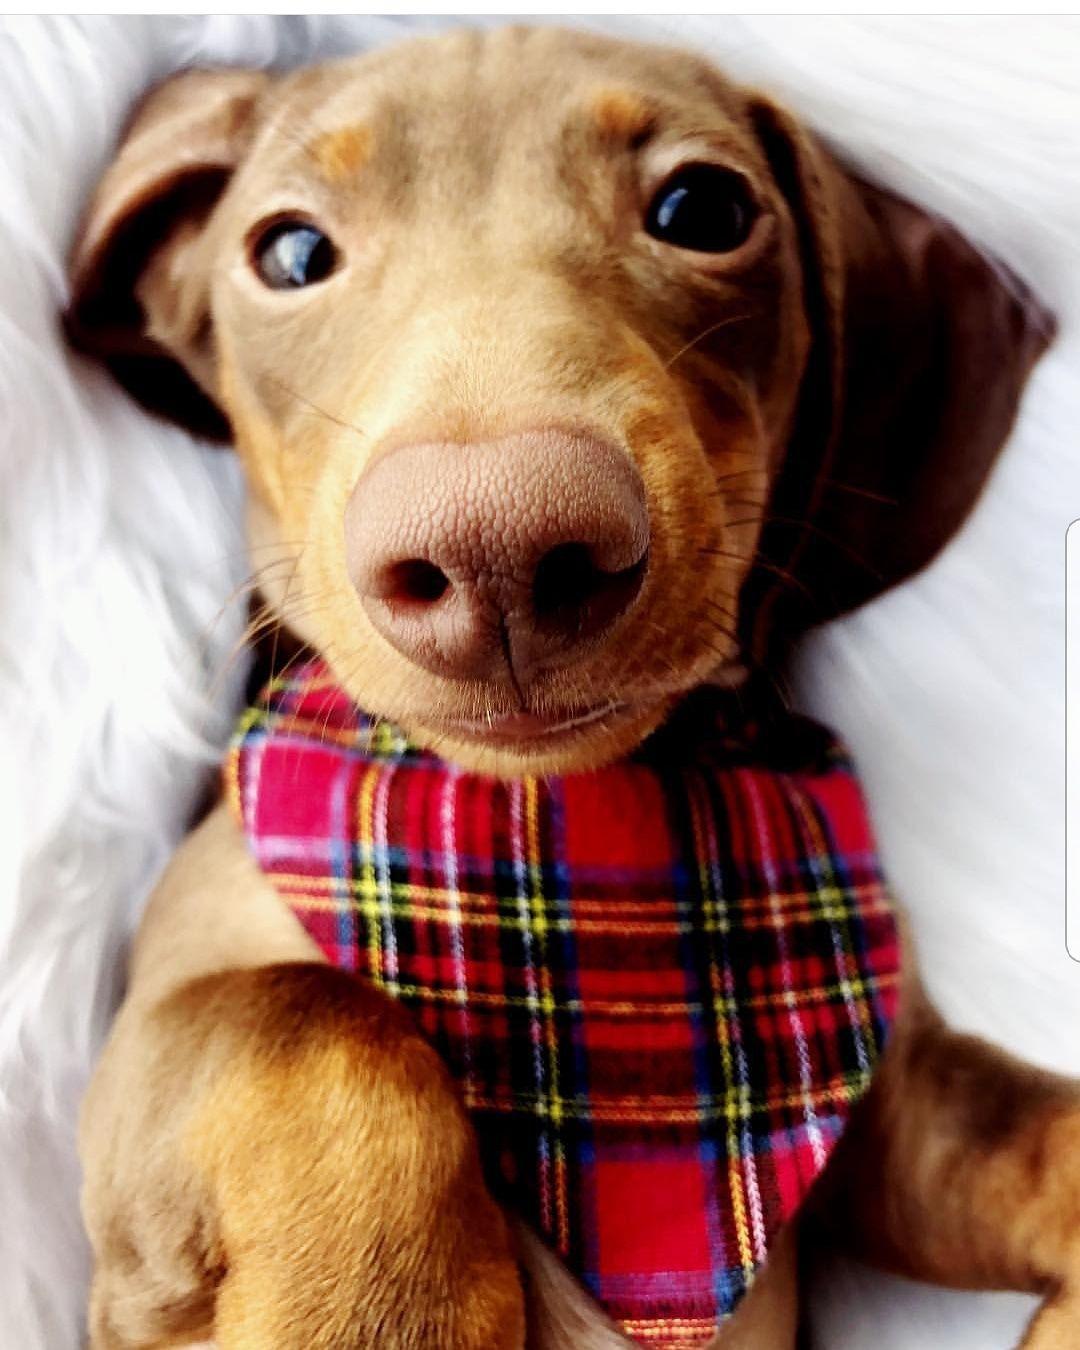 redtartanplaid holidayplaid flannel dogbandana